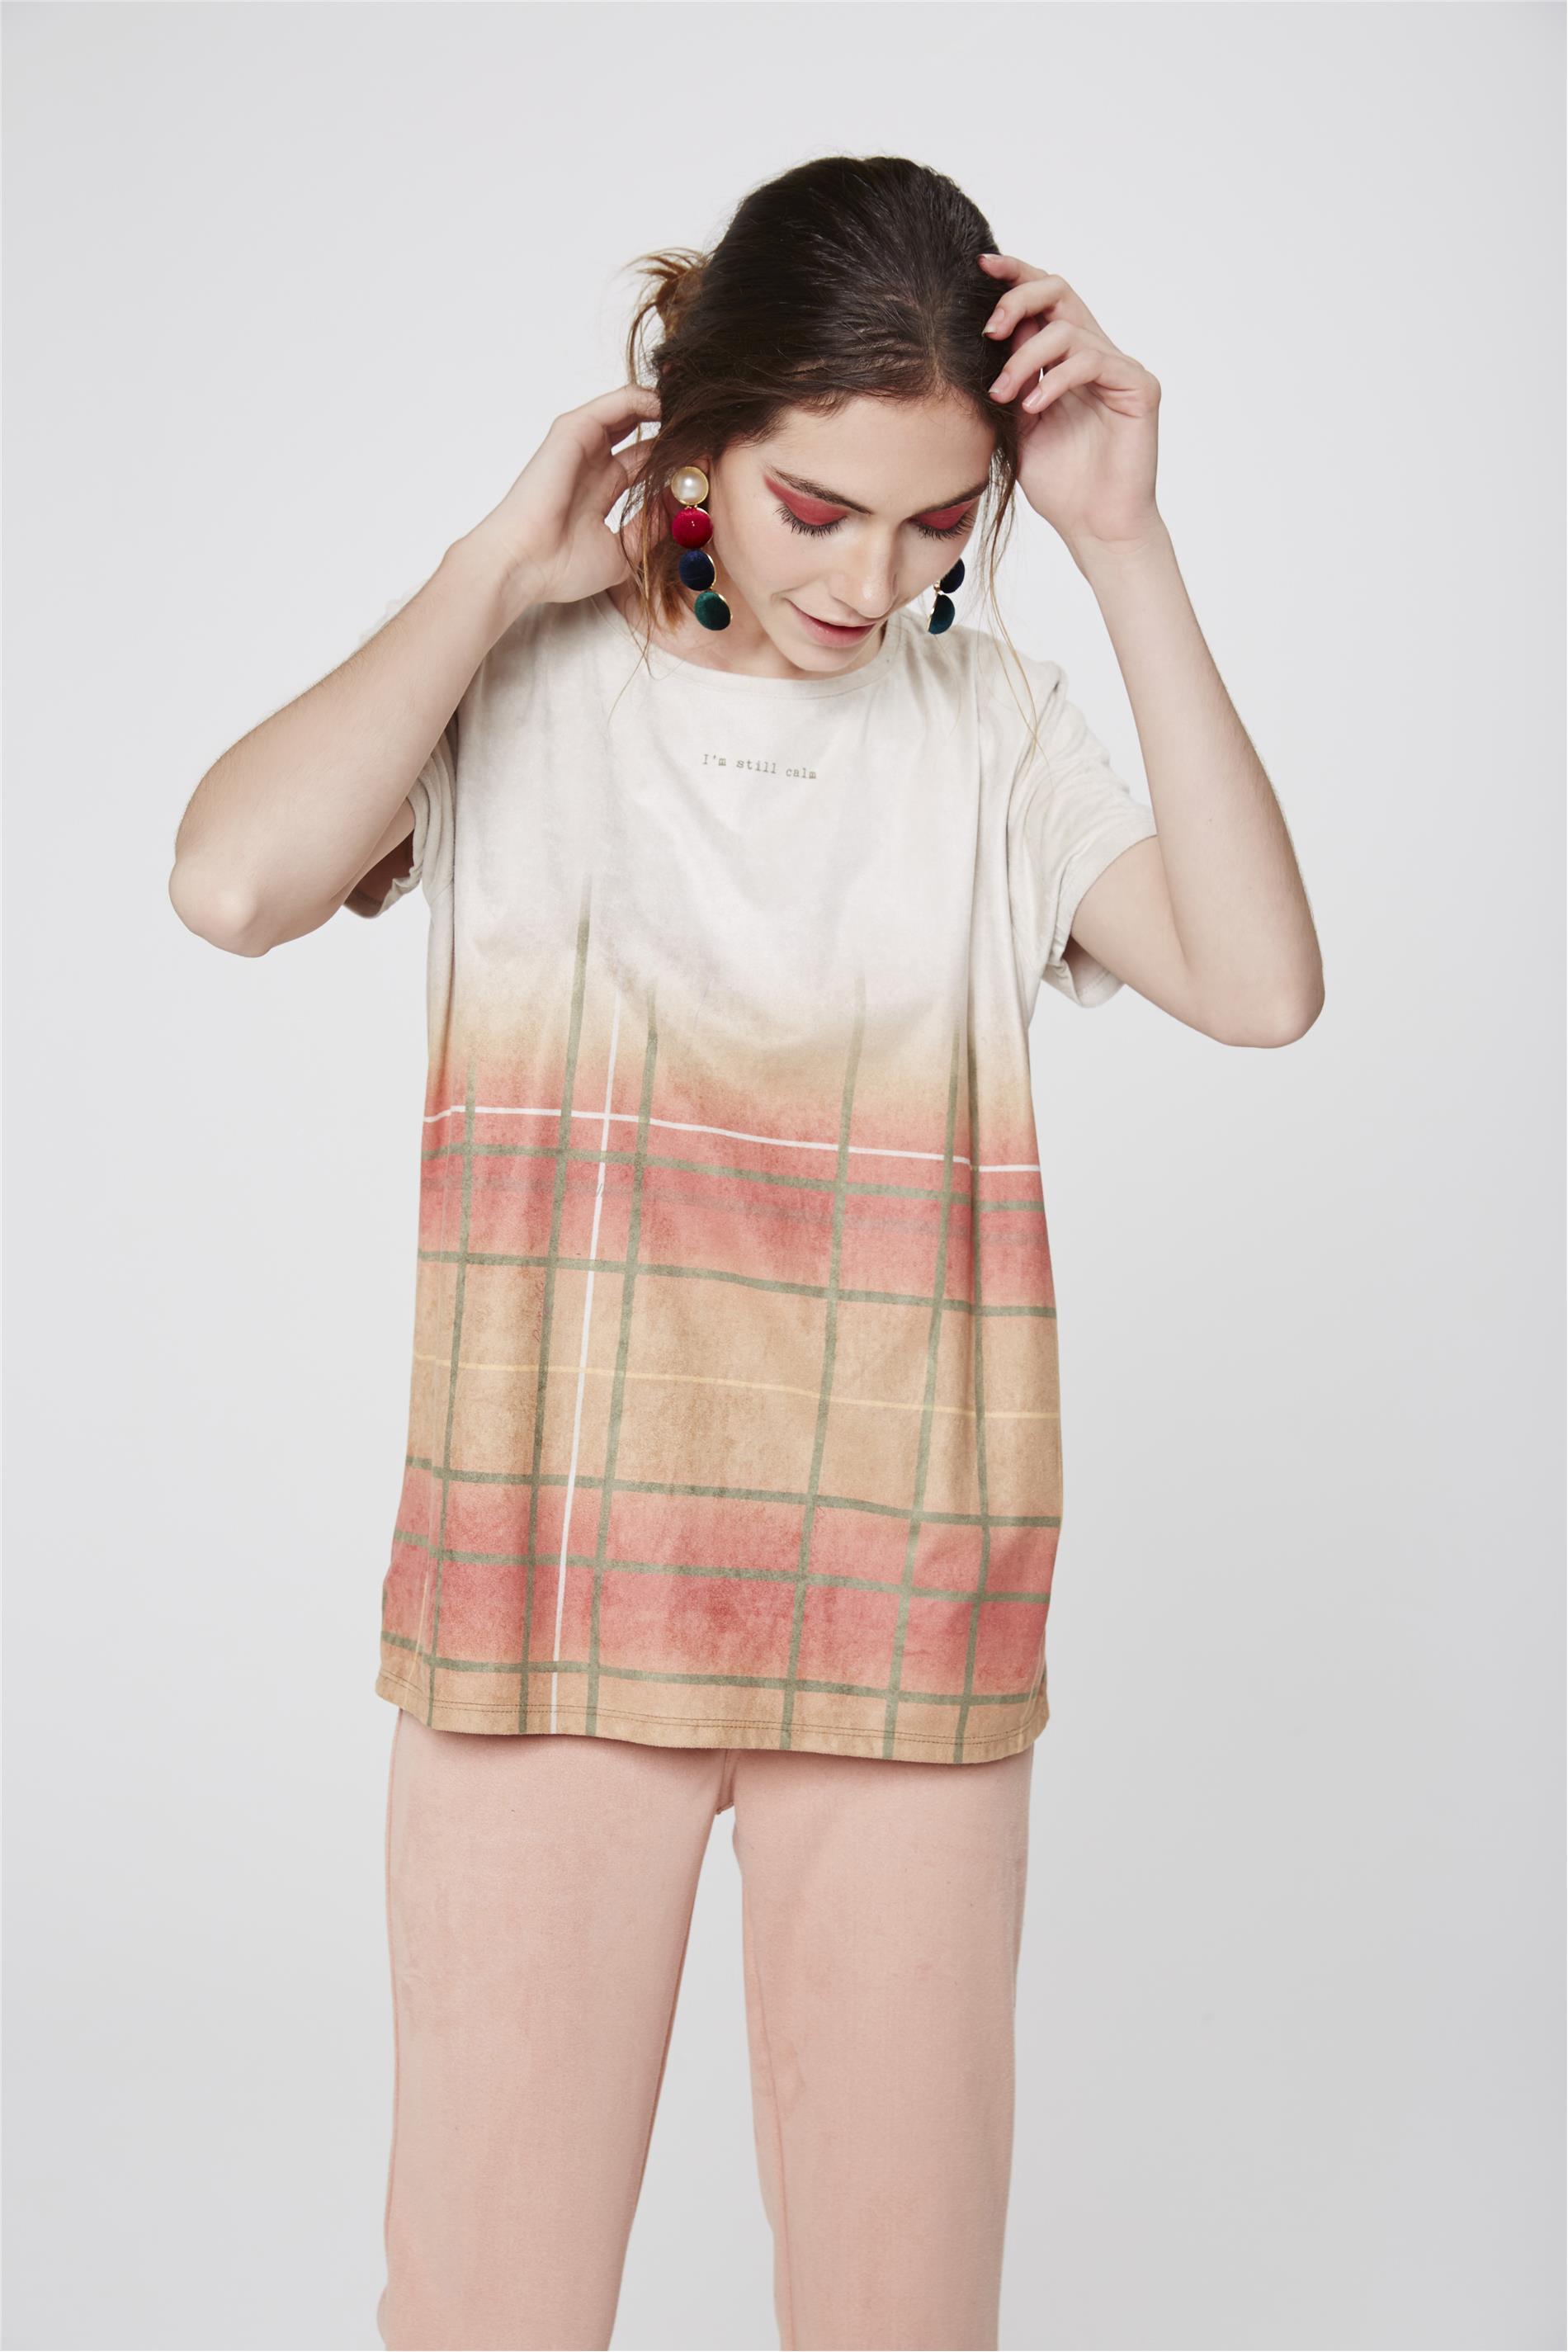 7e9a25385b Camiseta Suede Feminina - Damyller